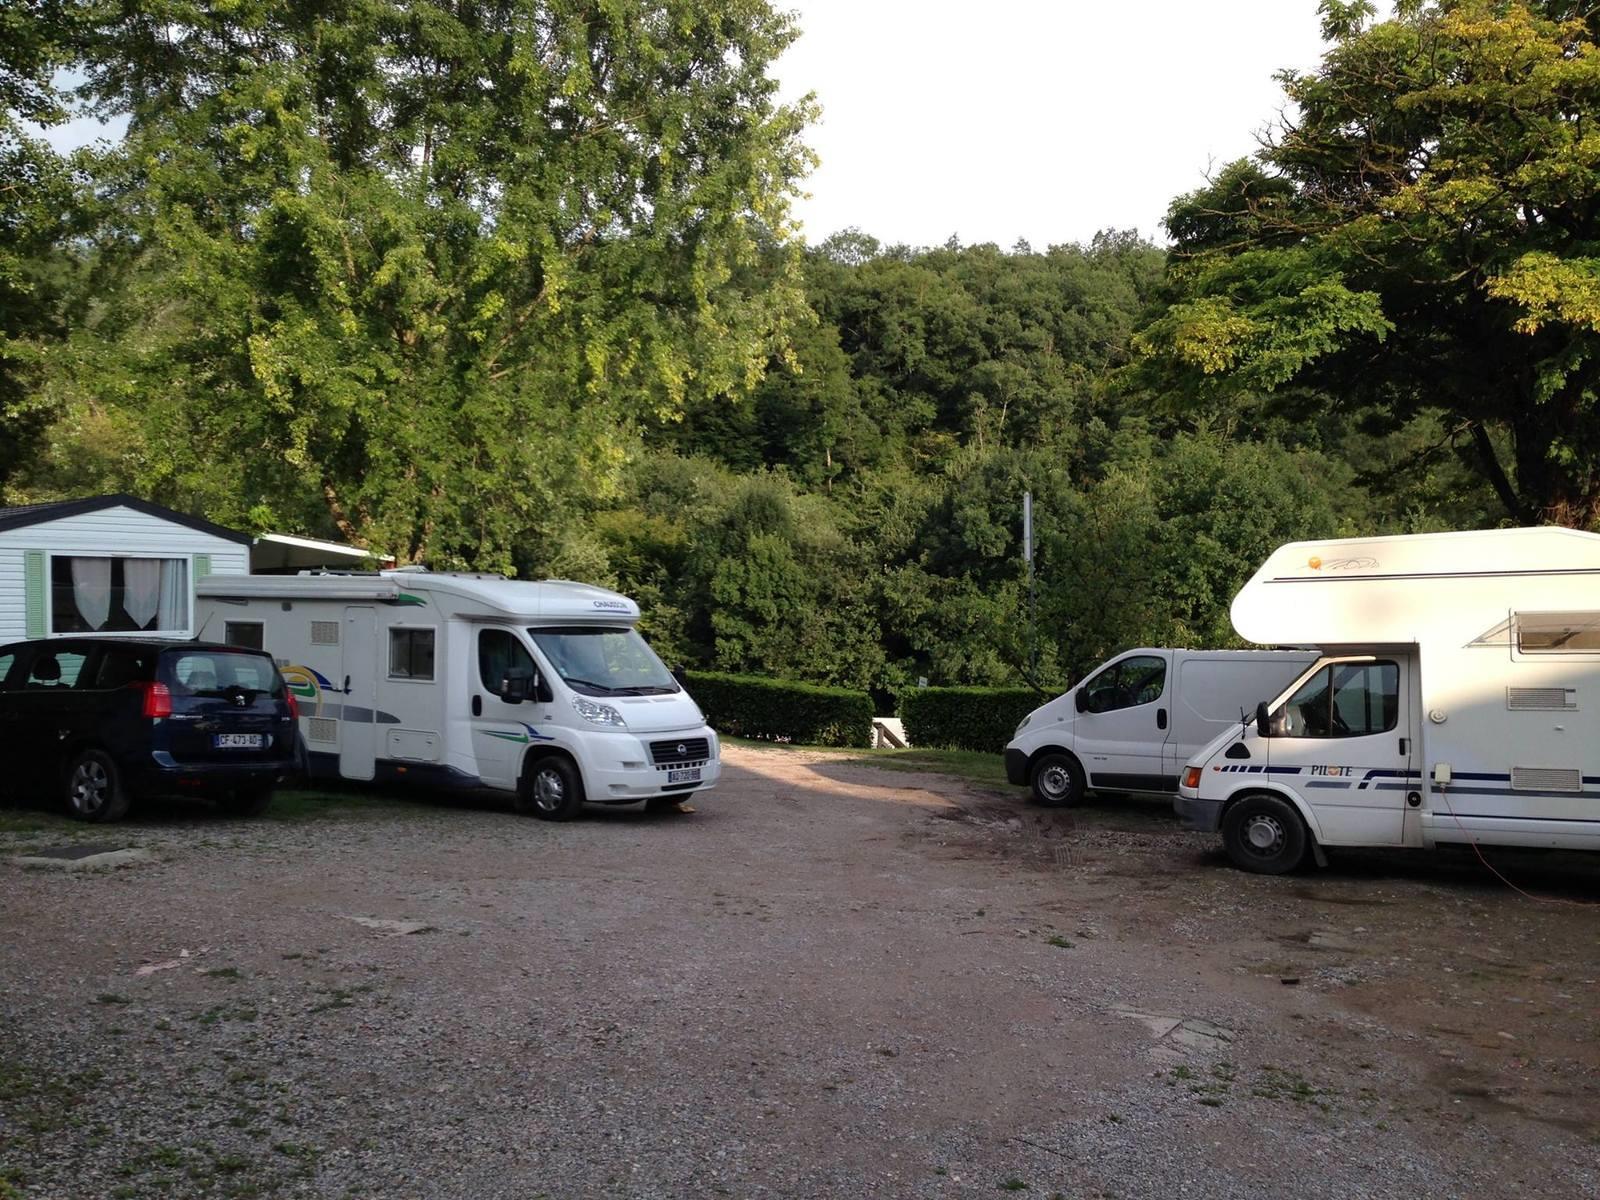 Camping Parc de Palétès, Saint-Girons, Ariège